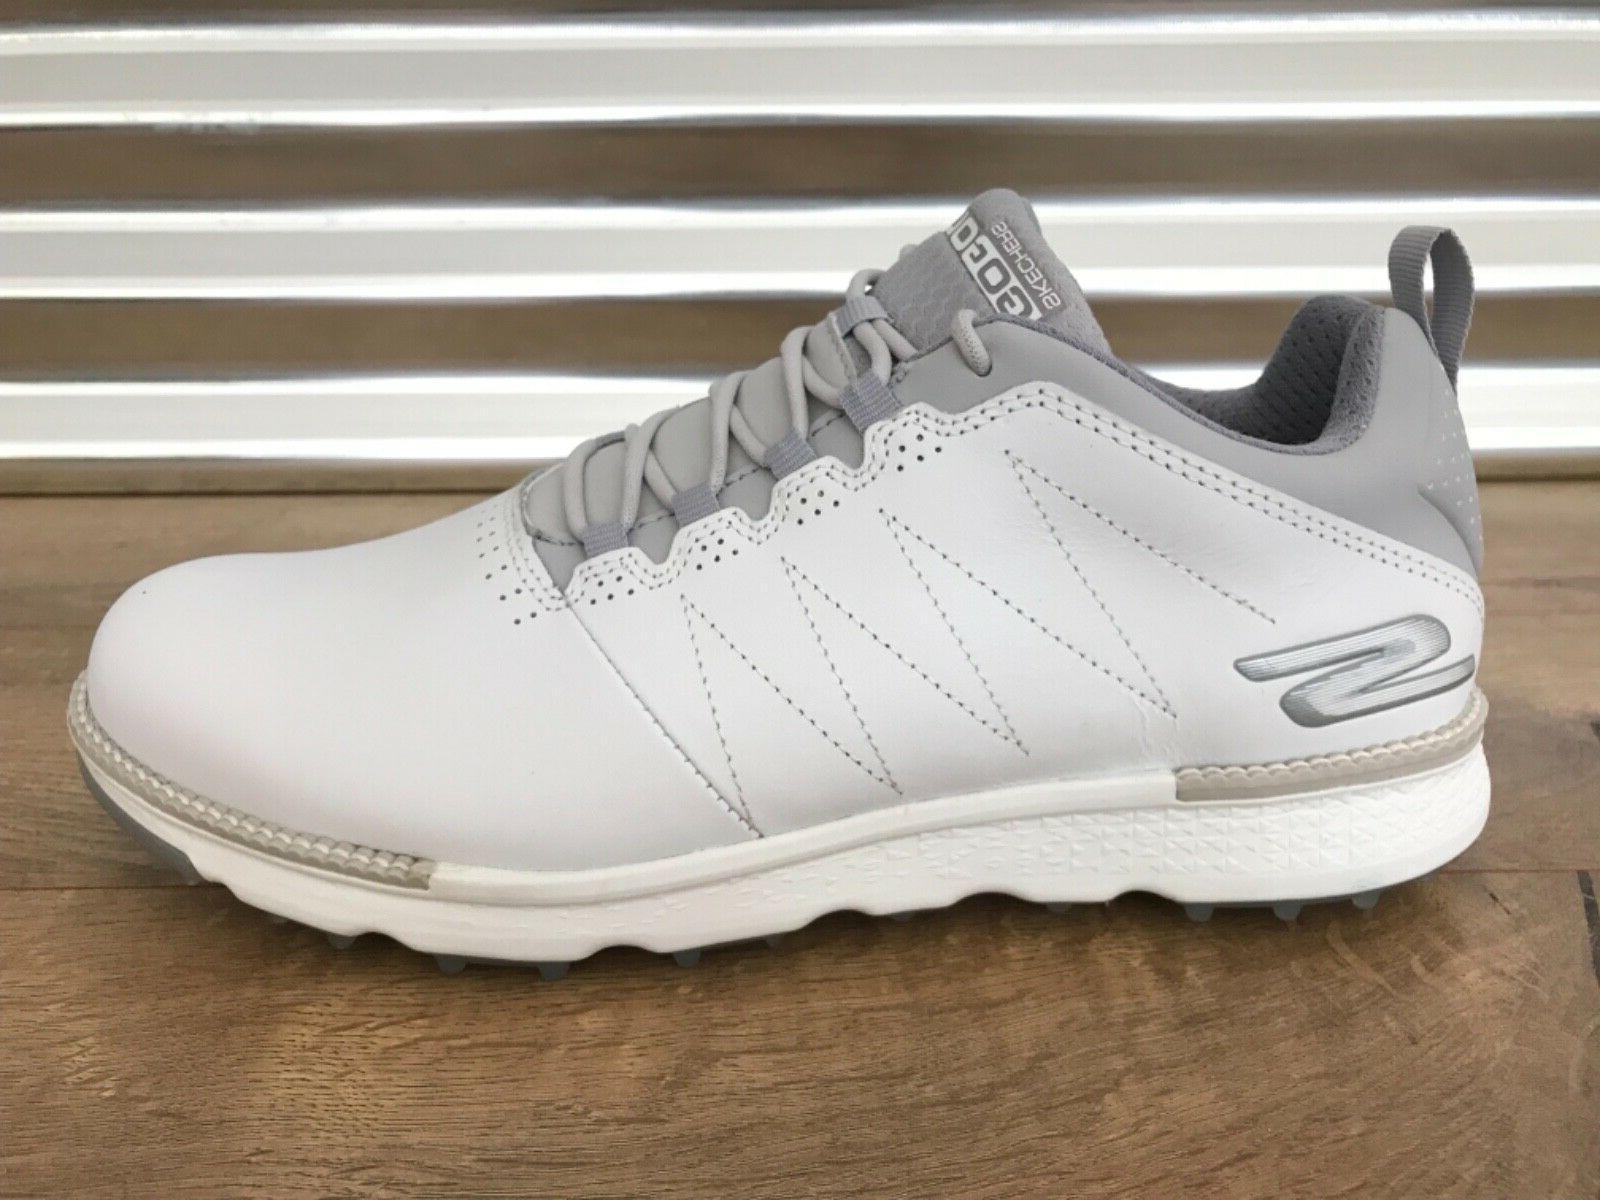 Skechers Golf V3 Golf Shoes Gray Mens SZ